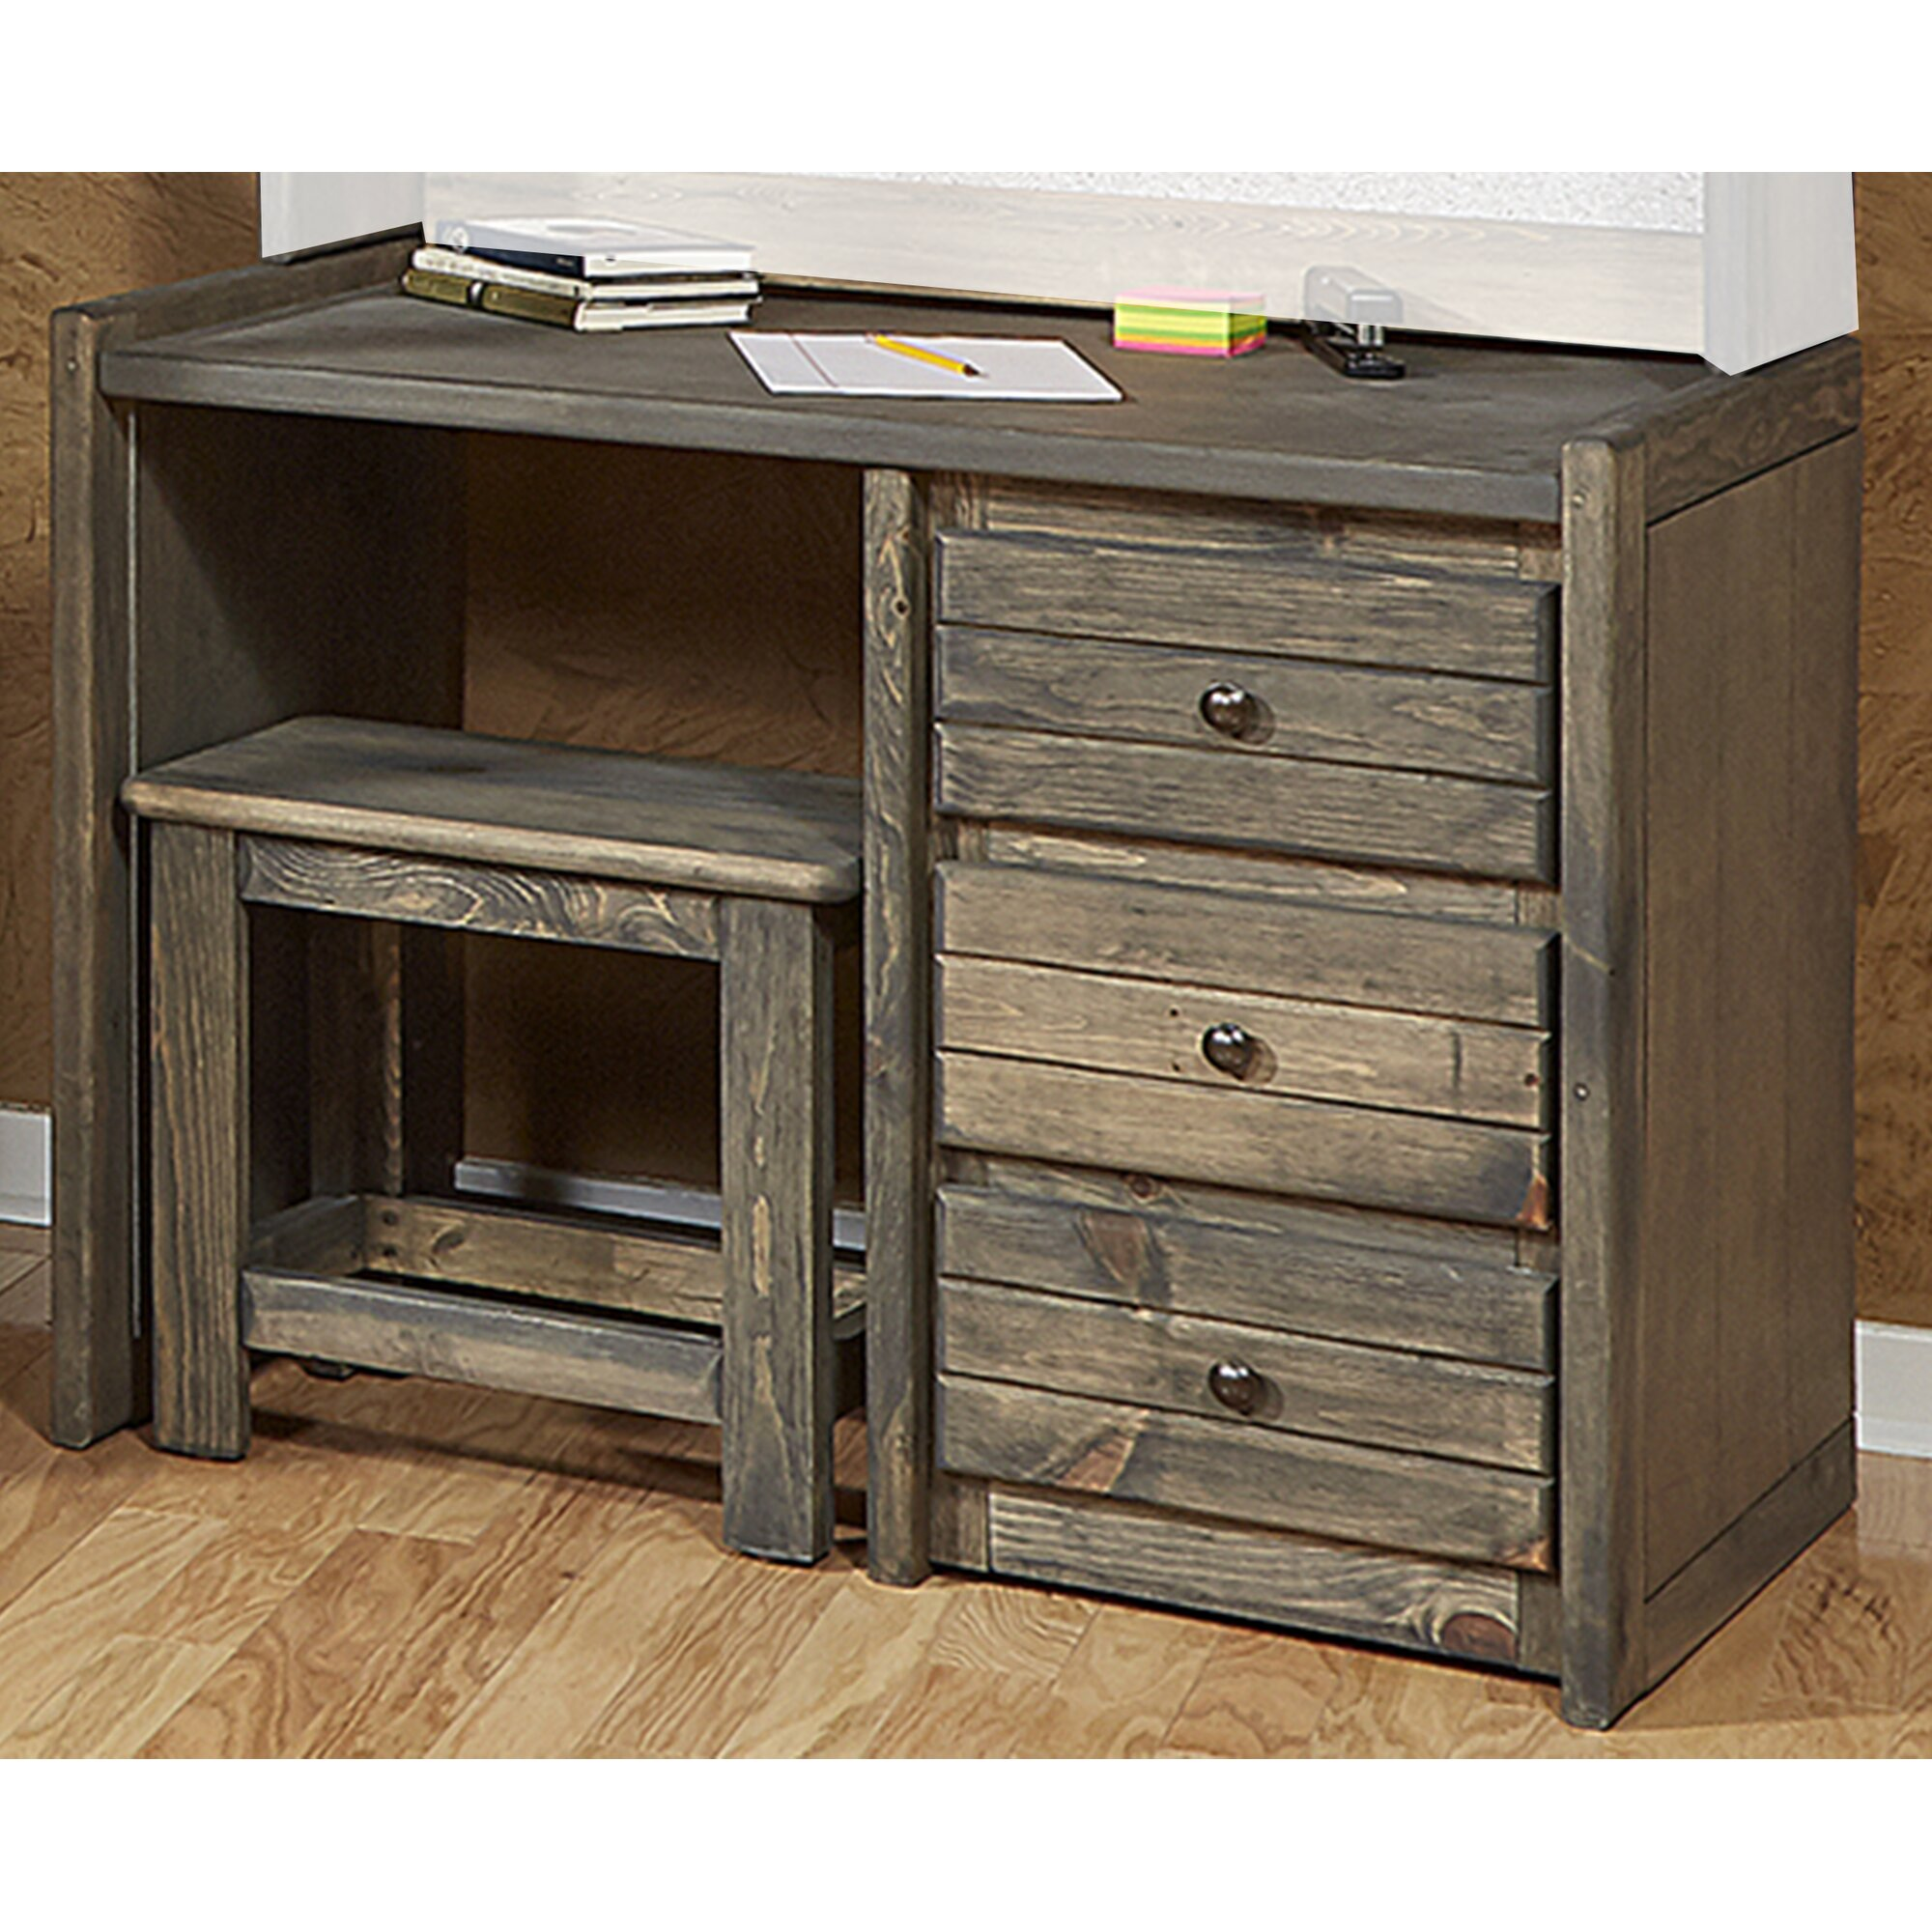 Chelsea home furniture driftwood student desk and chair - Student desk and chair set ...